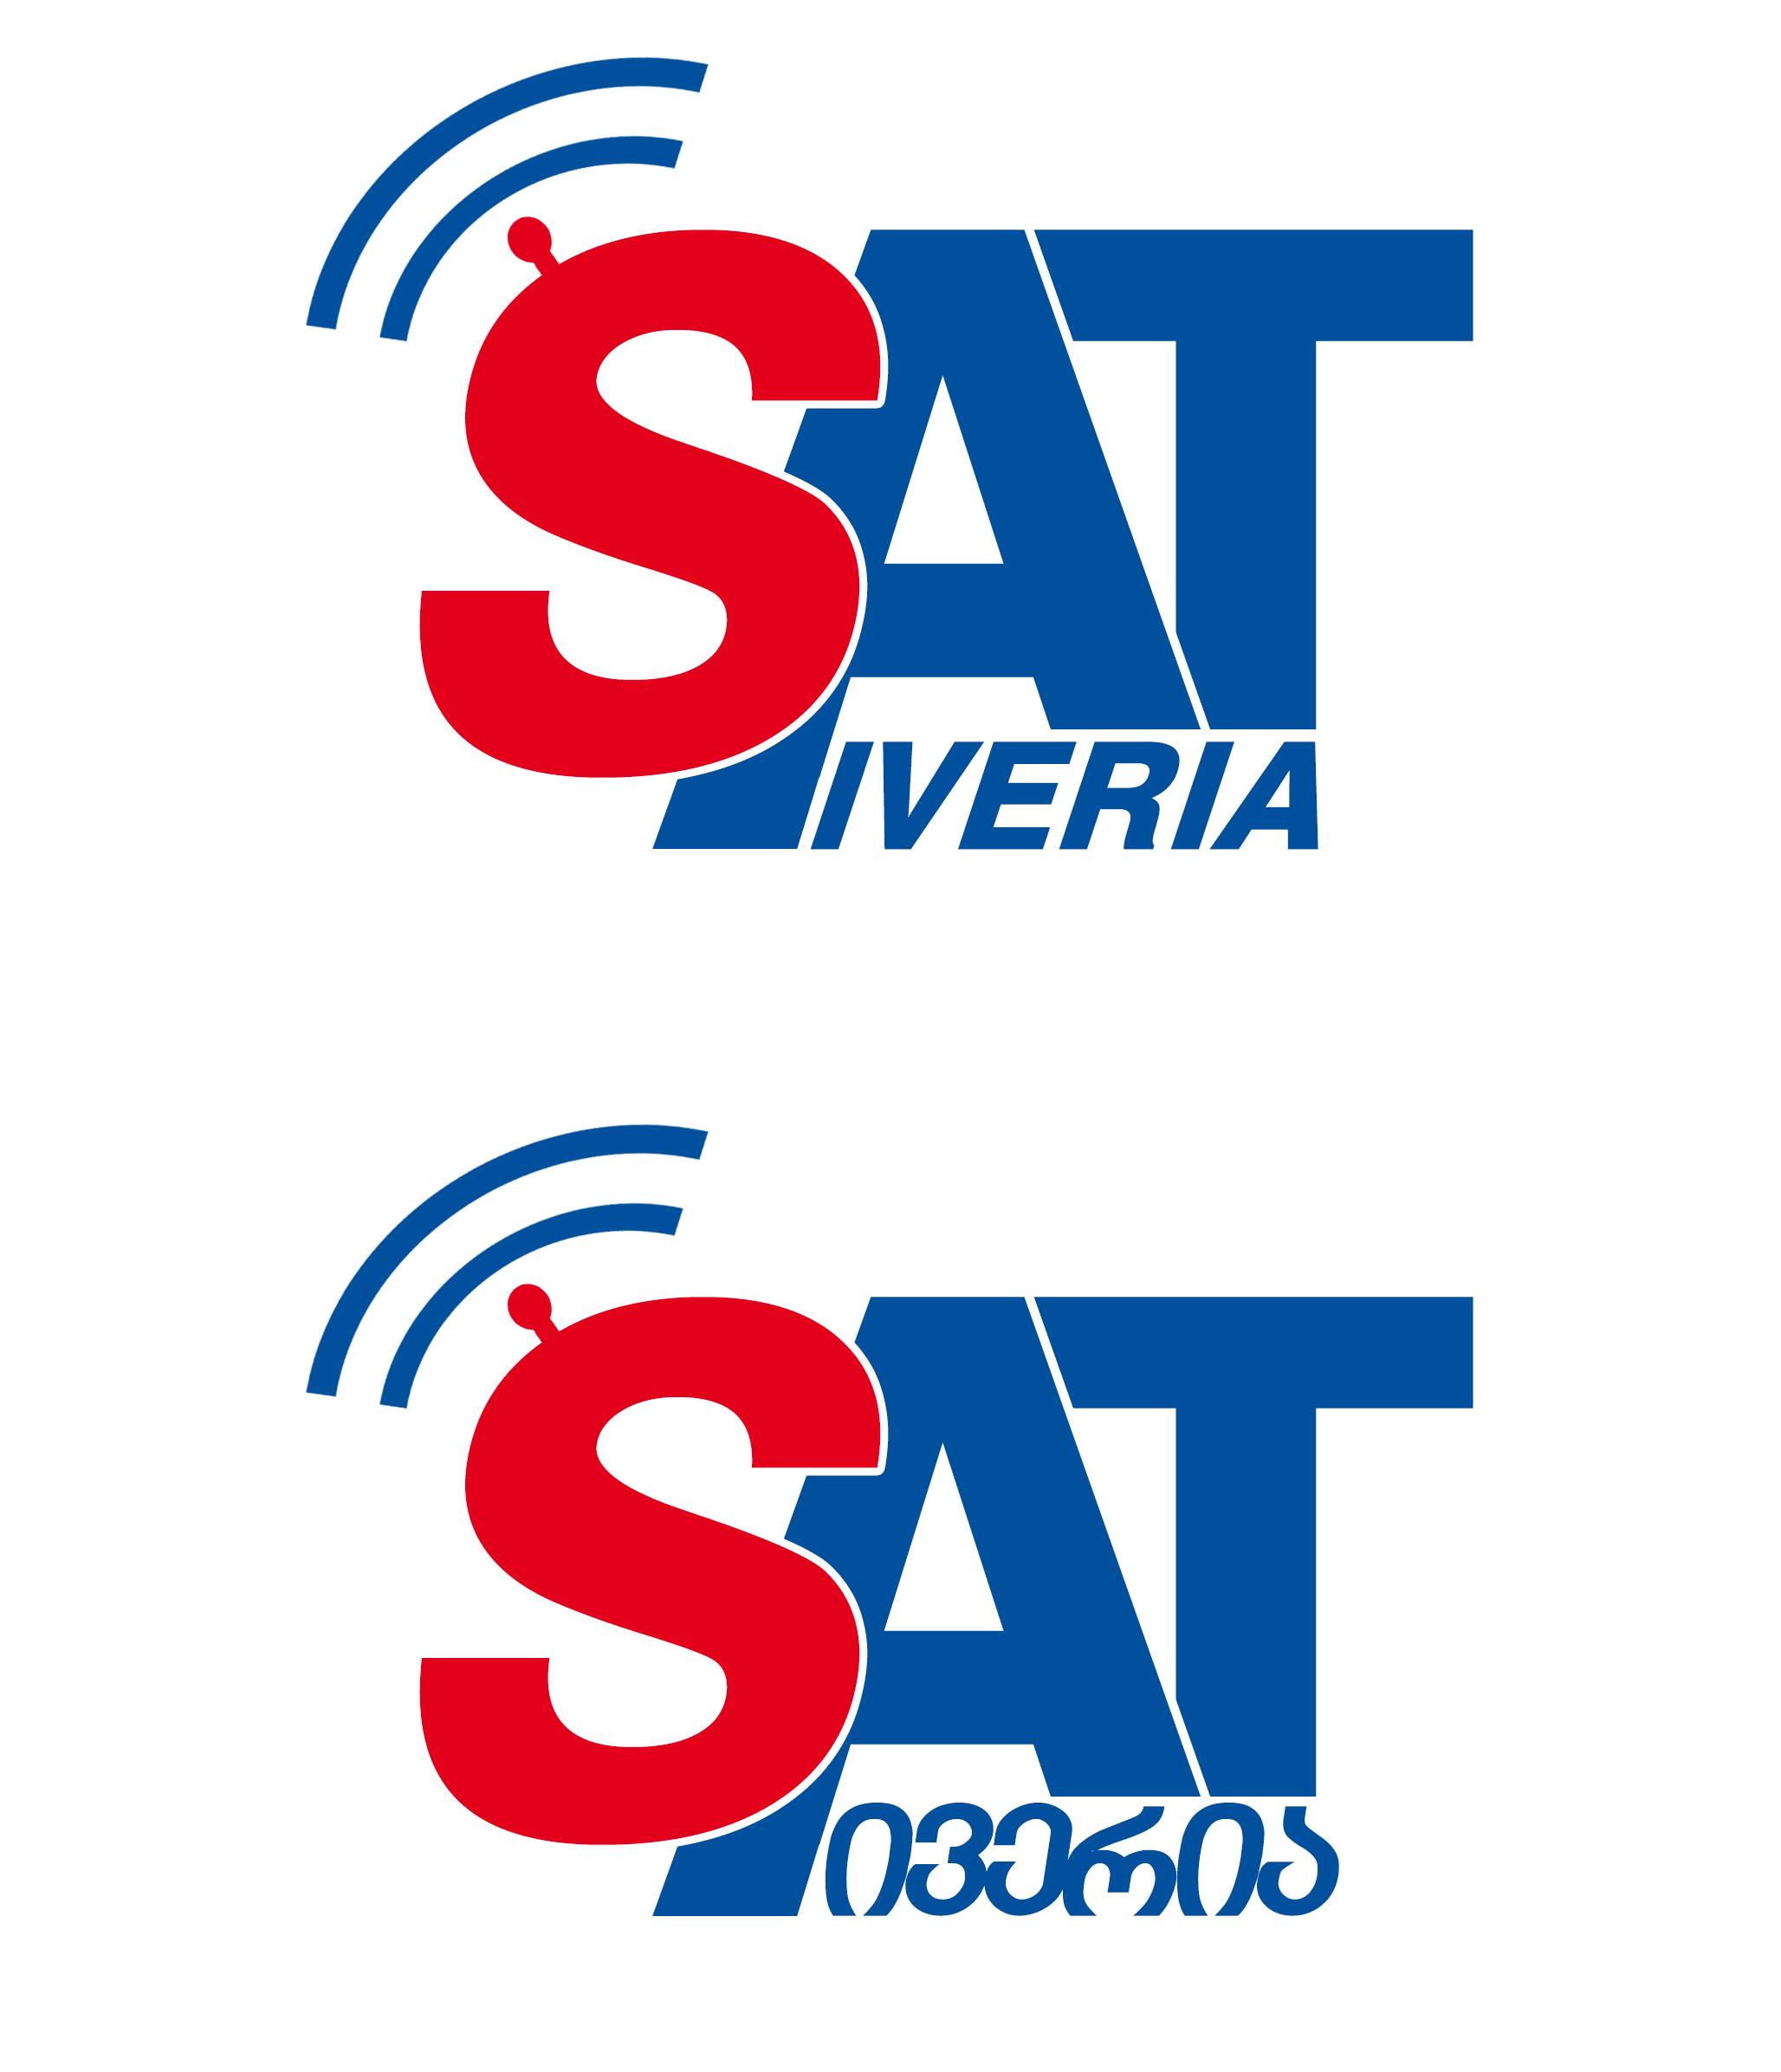 iveria sat logo design by giozaga on deviantart